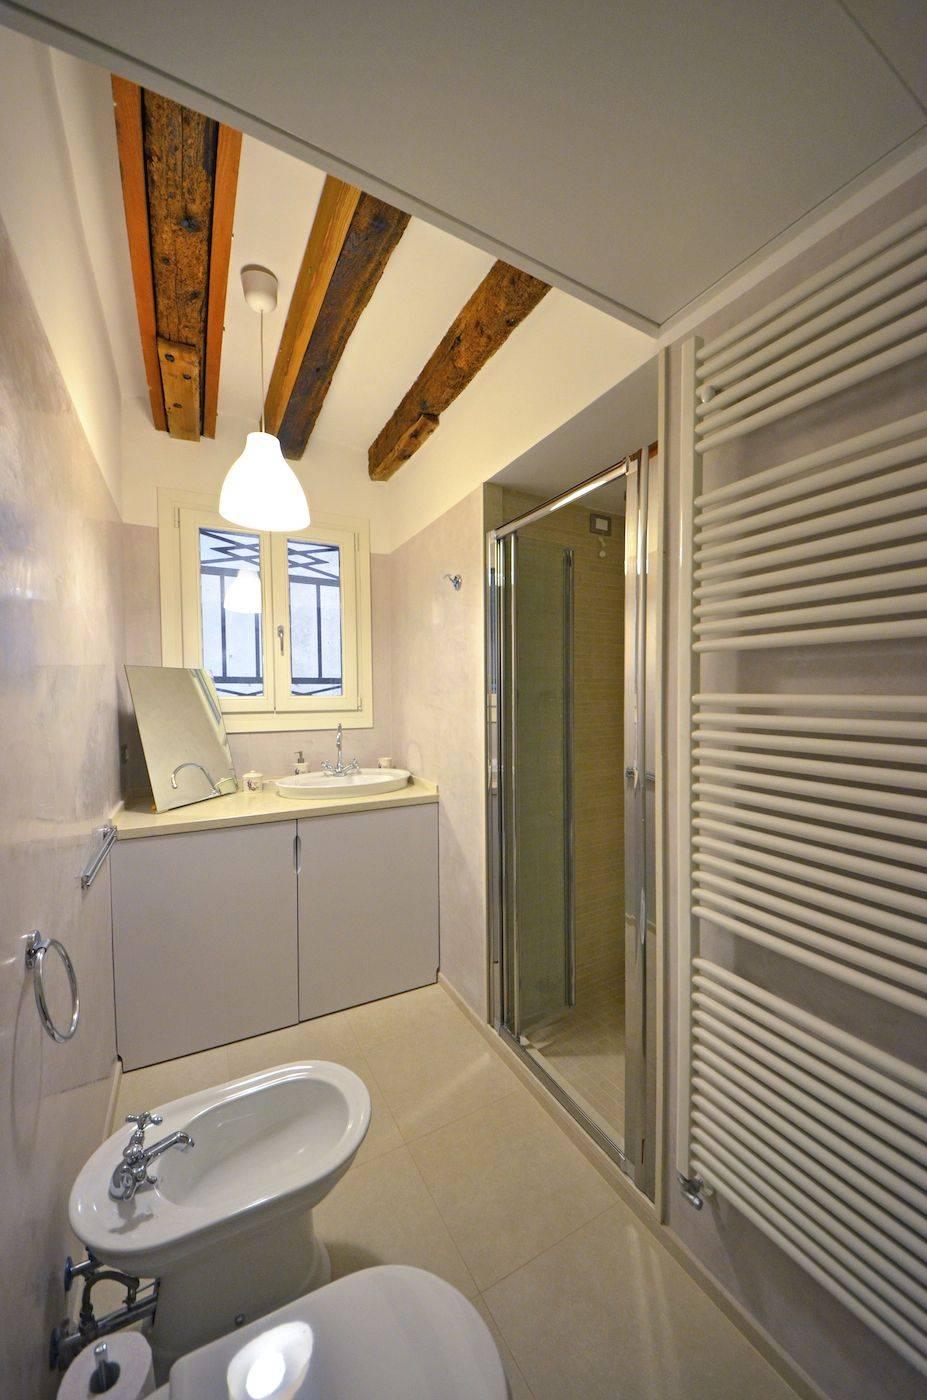 second bathroom of the Palladio Garden apartment